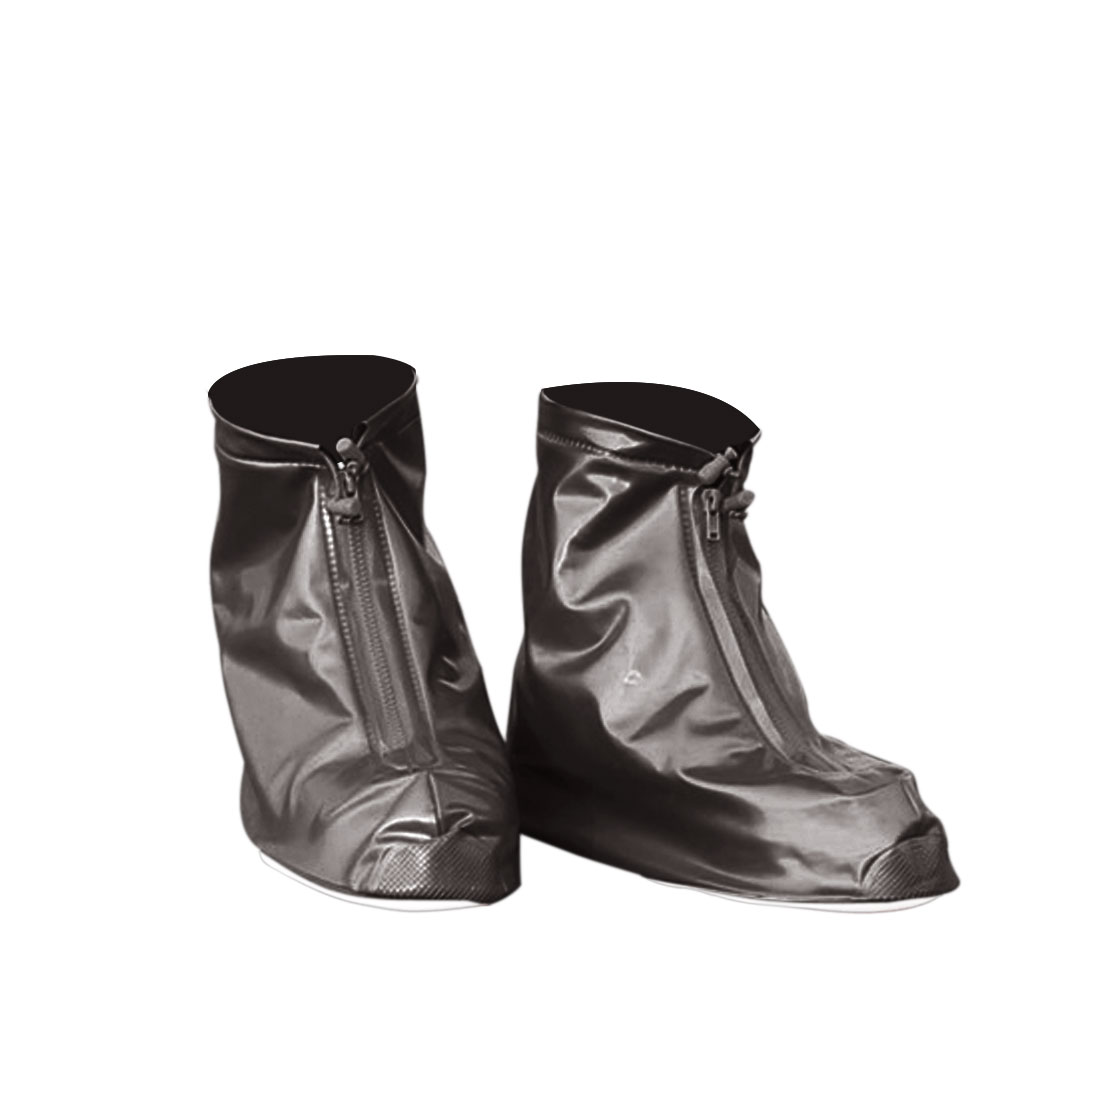 1 Pair Coffee Color Size L Unisex PVC Nonslip Reusable Waterproof Rain Shoes Cover Guard Overshoes